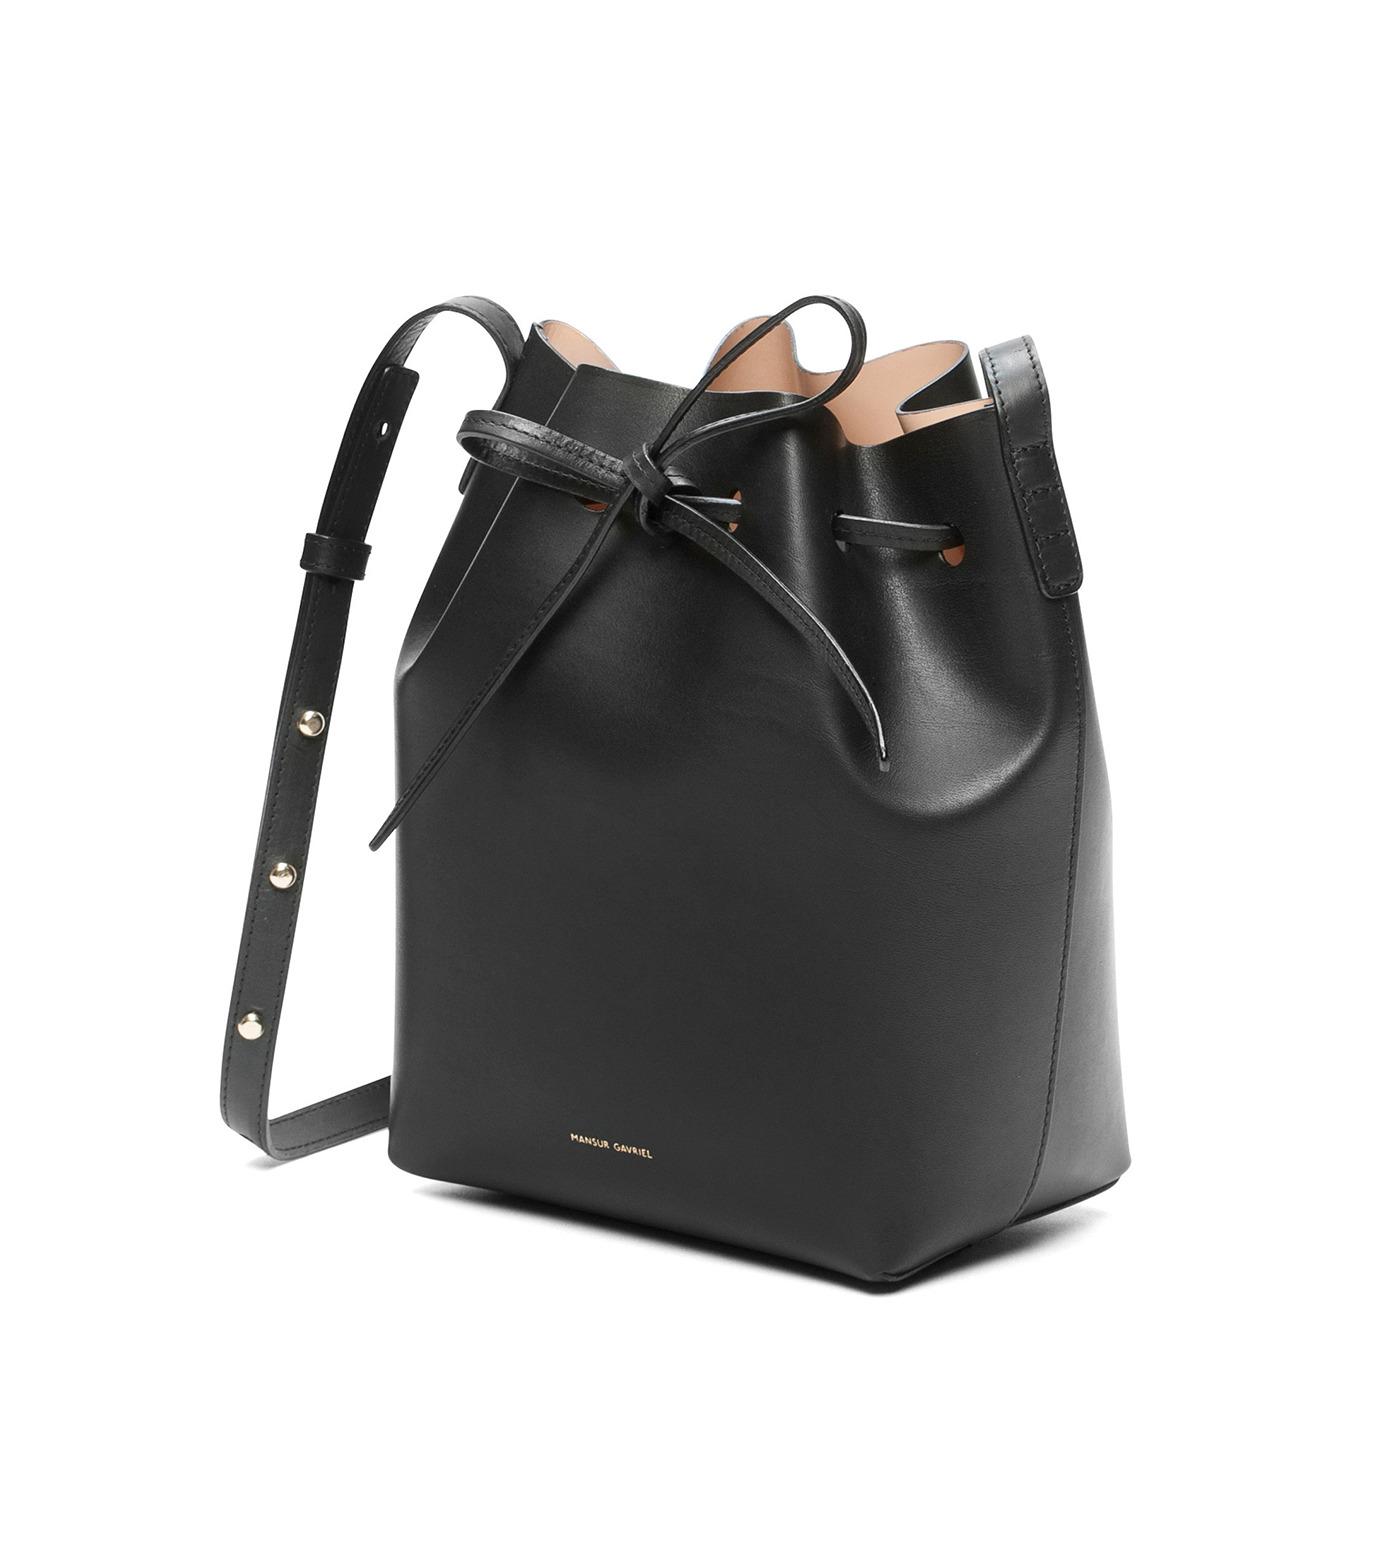 Mansur Gavriel(マンサーガブリエル)のmini bucket bag-BLACK(ショルダーバッグ/shoulder bag)-HMB004VC-13 拡大詳細画像2